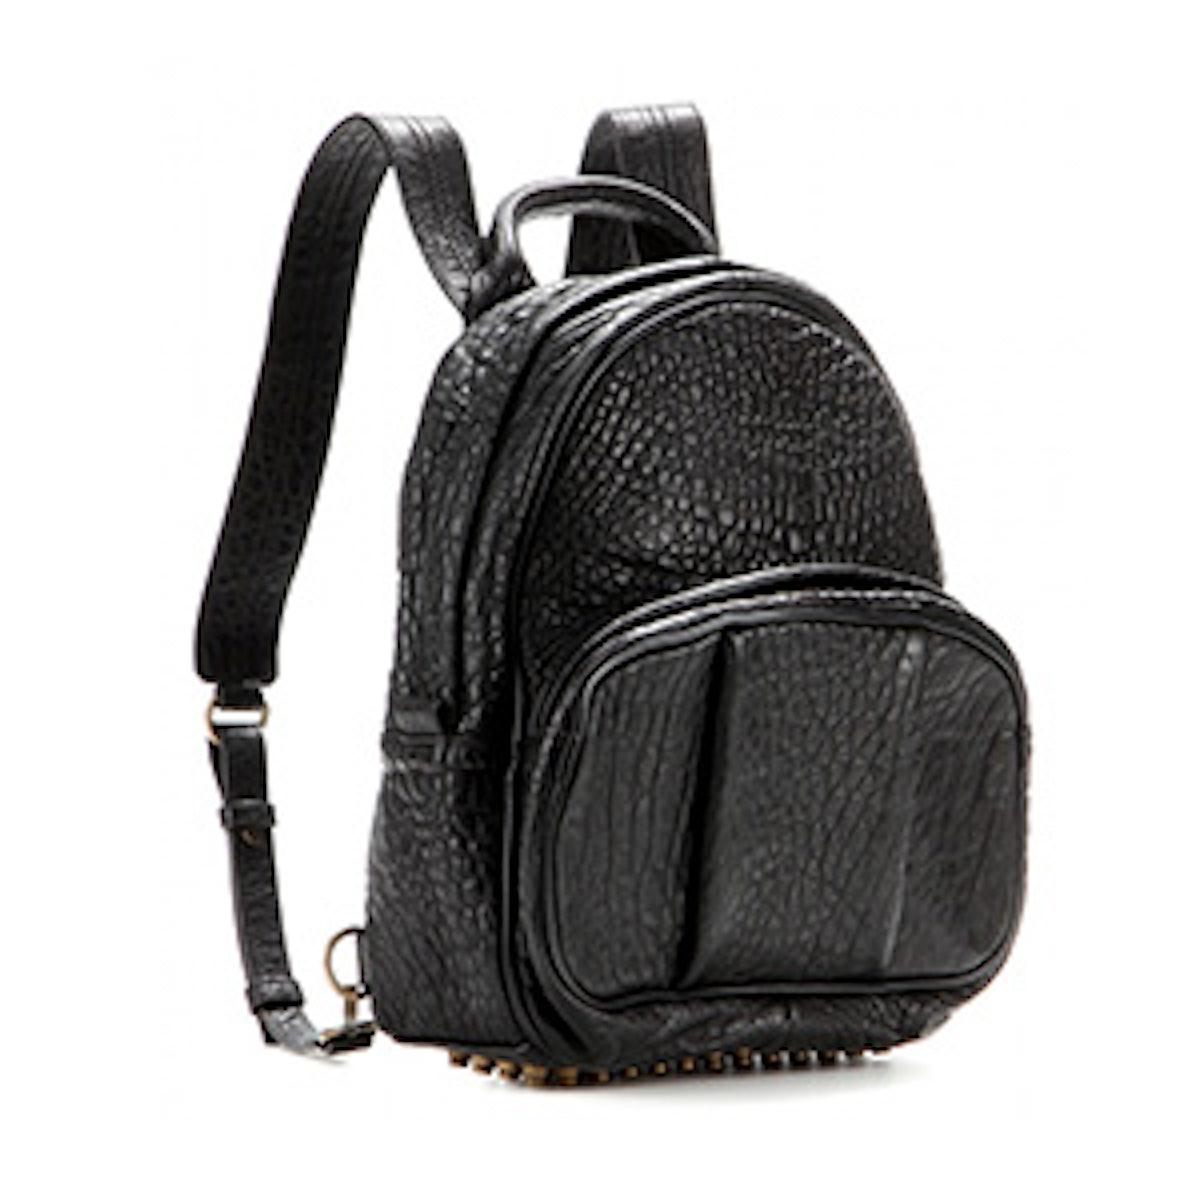 Dumbo Leather Backpack